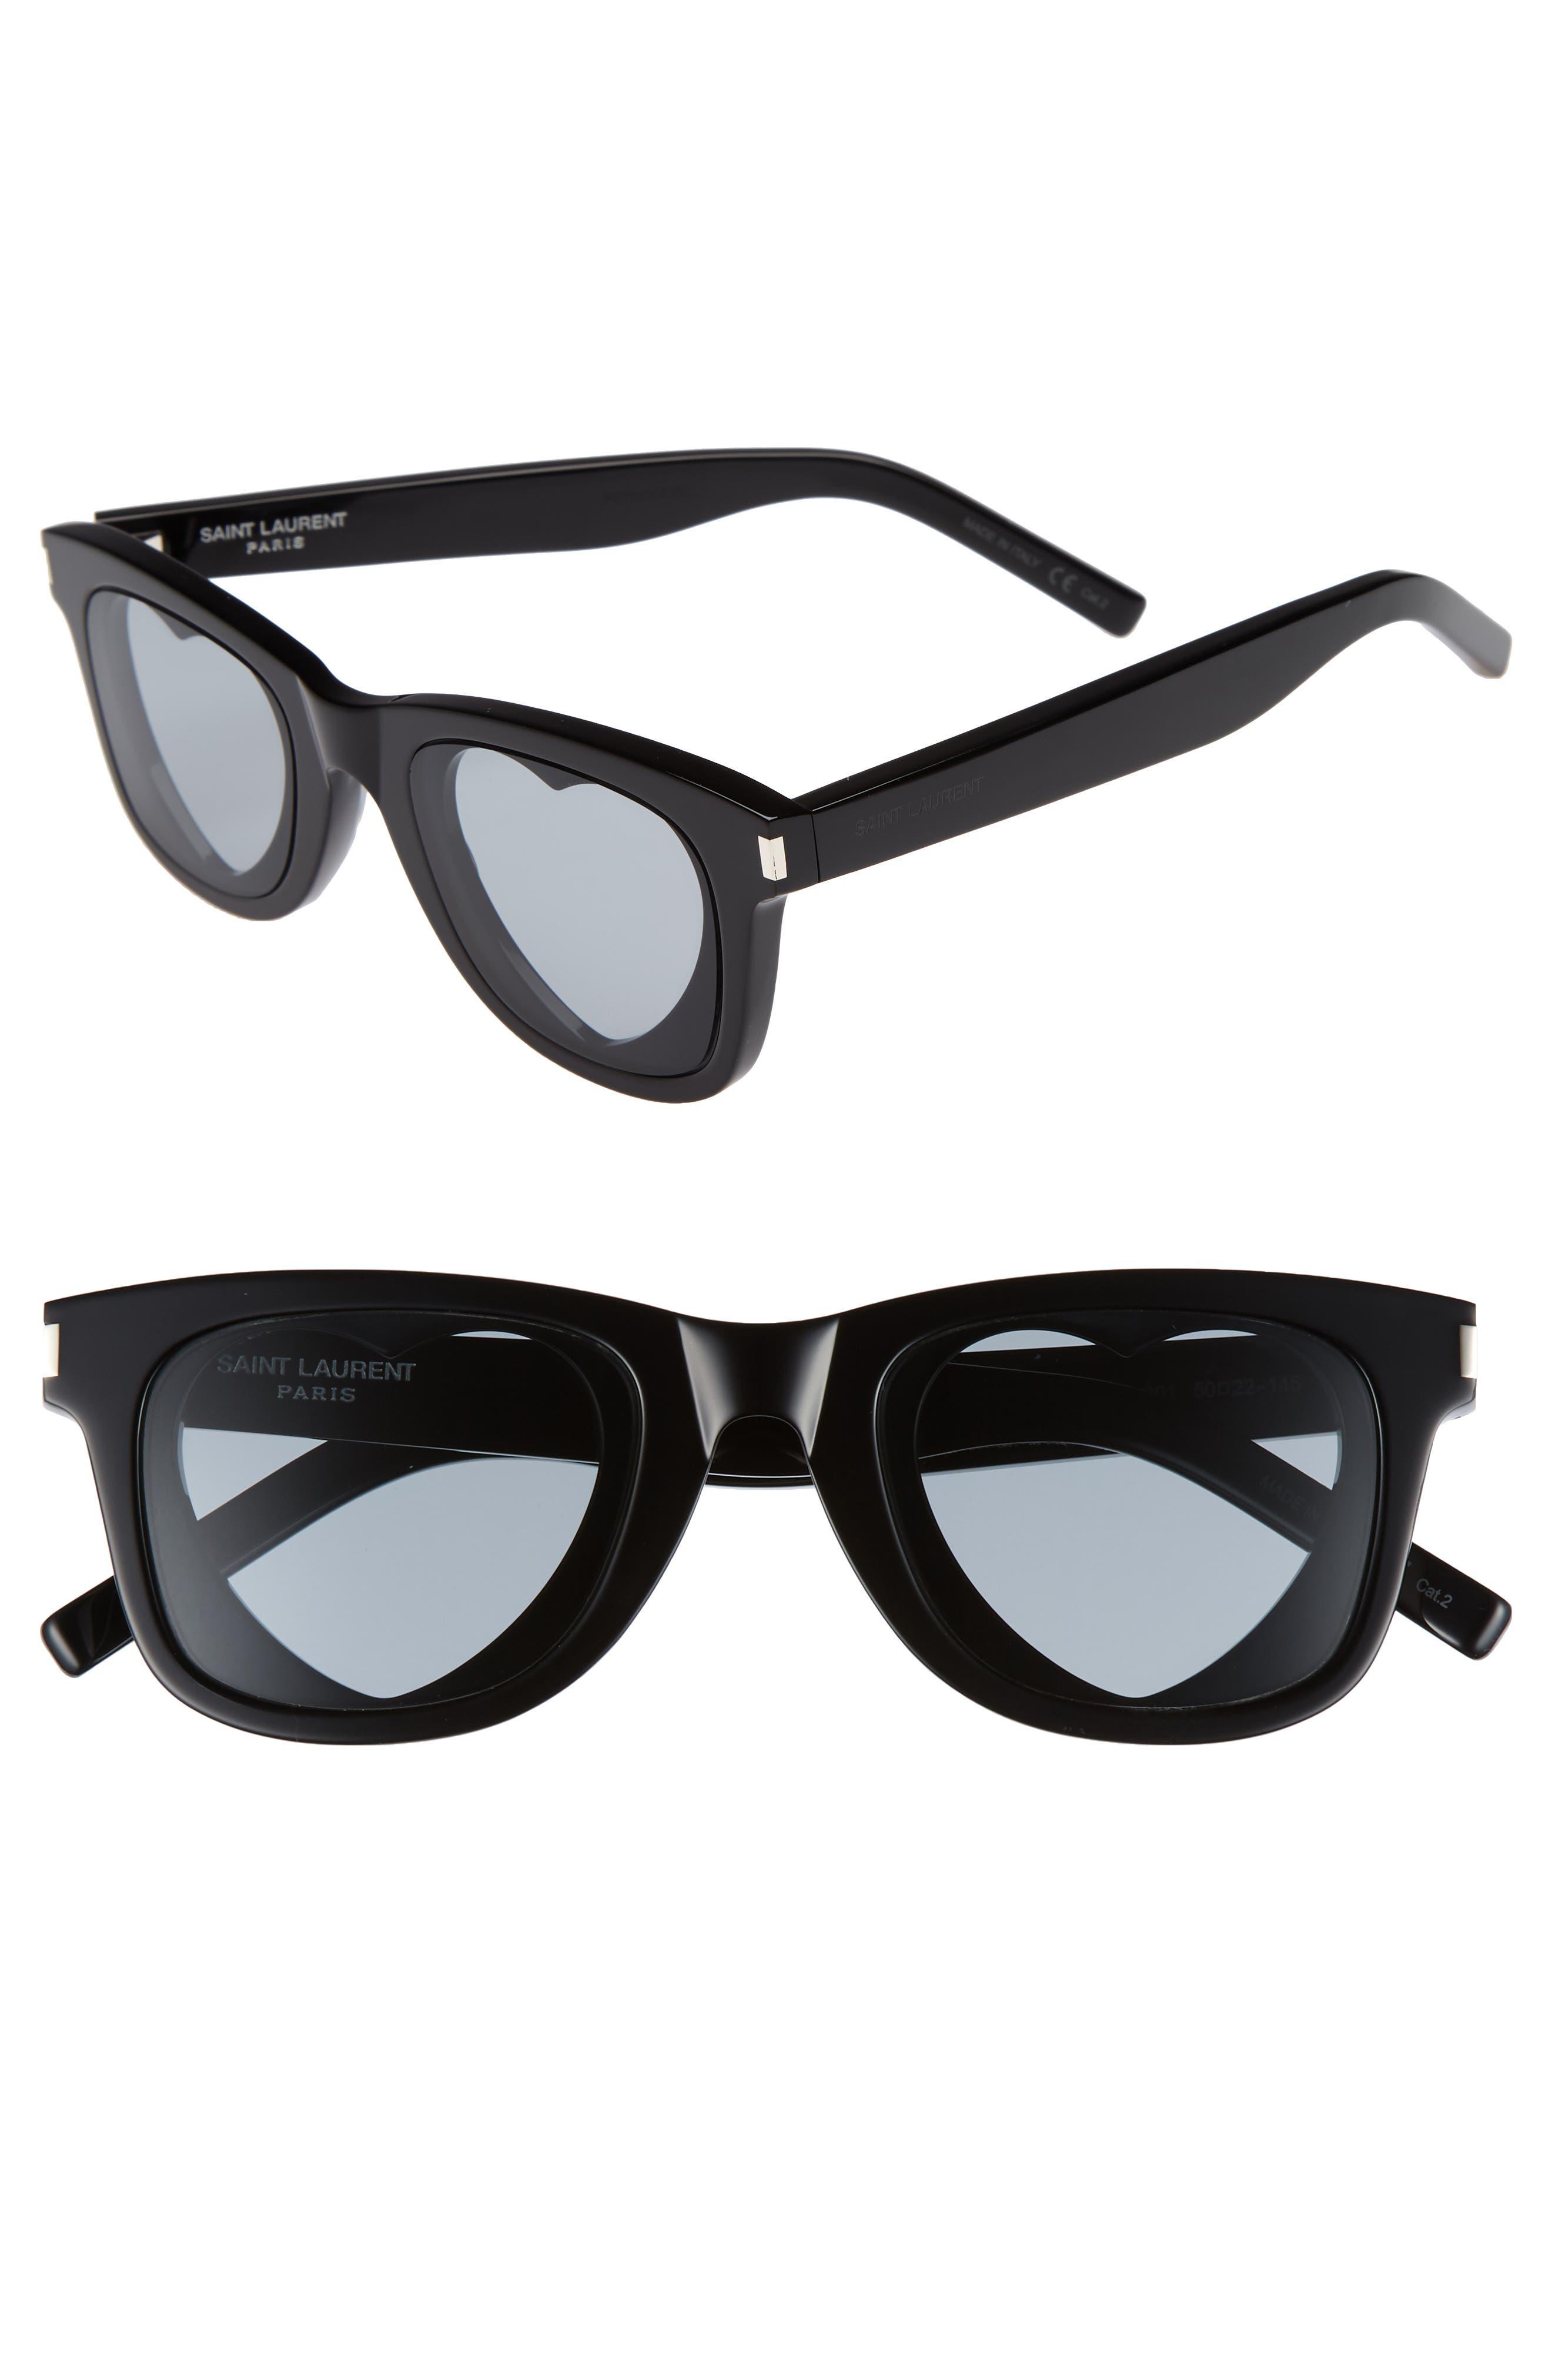 50mm Heart Sunglasses,                             Main thumbnail 1, color,                             001